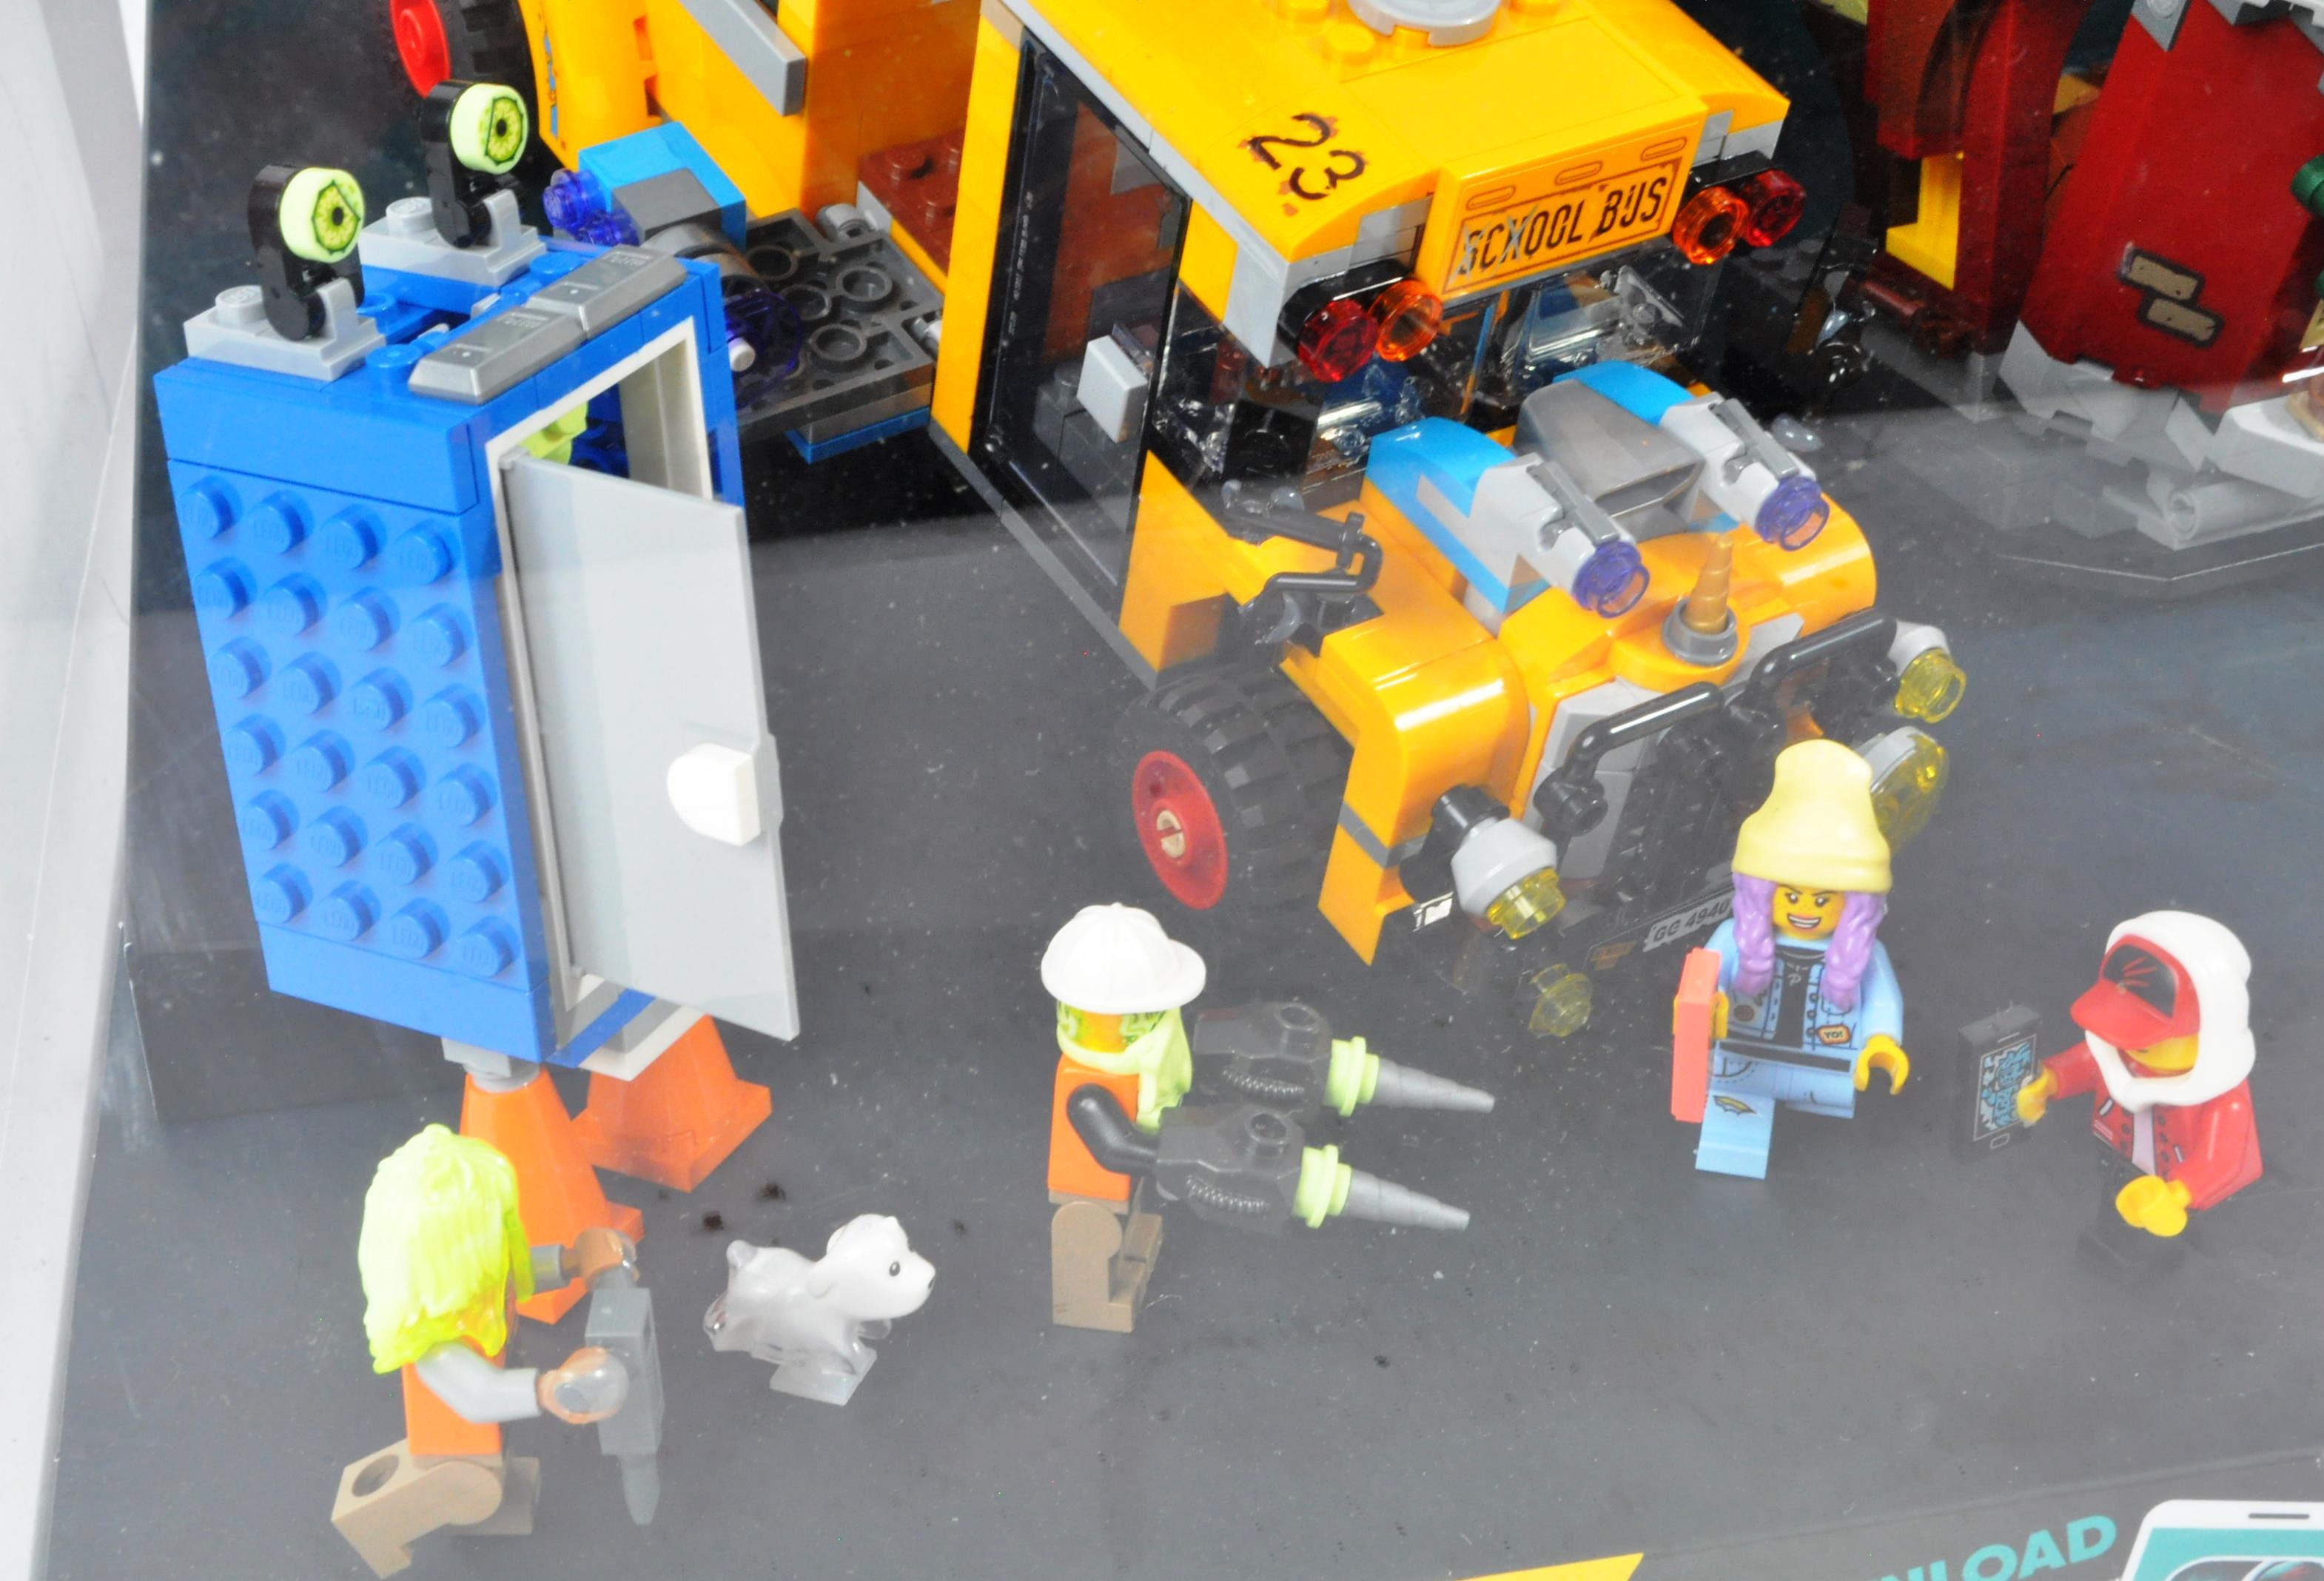 LEGO - HIDDEN SIDE - ORIGINAL IN STORE SHOP DISPLAY CABINET - Image 5 of 8